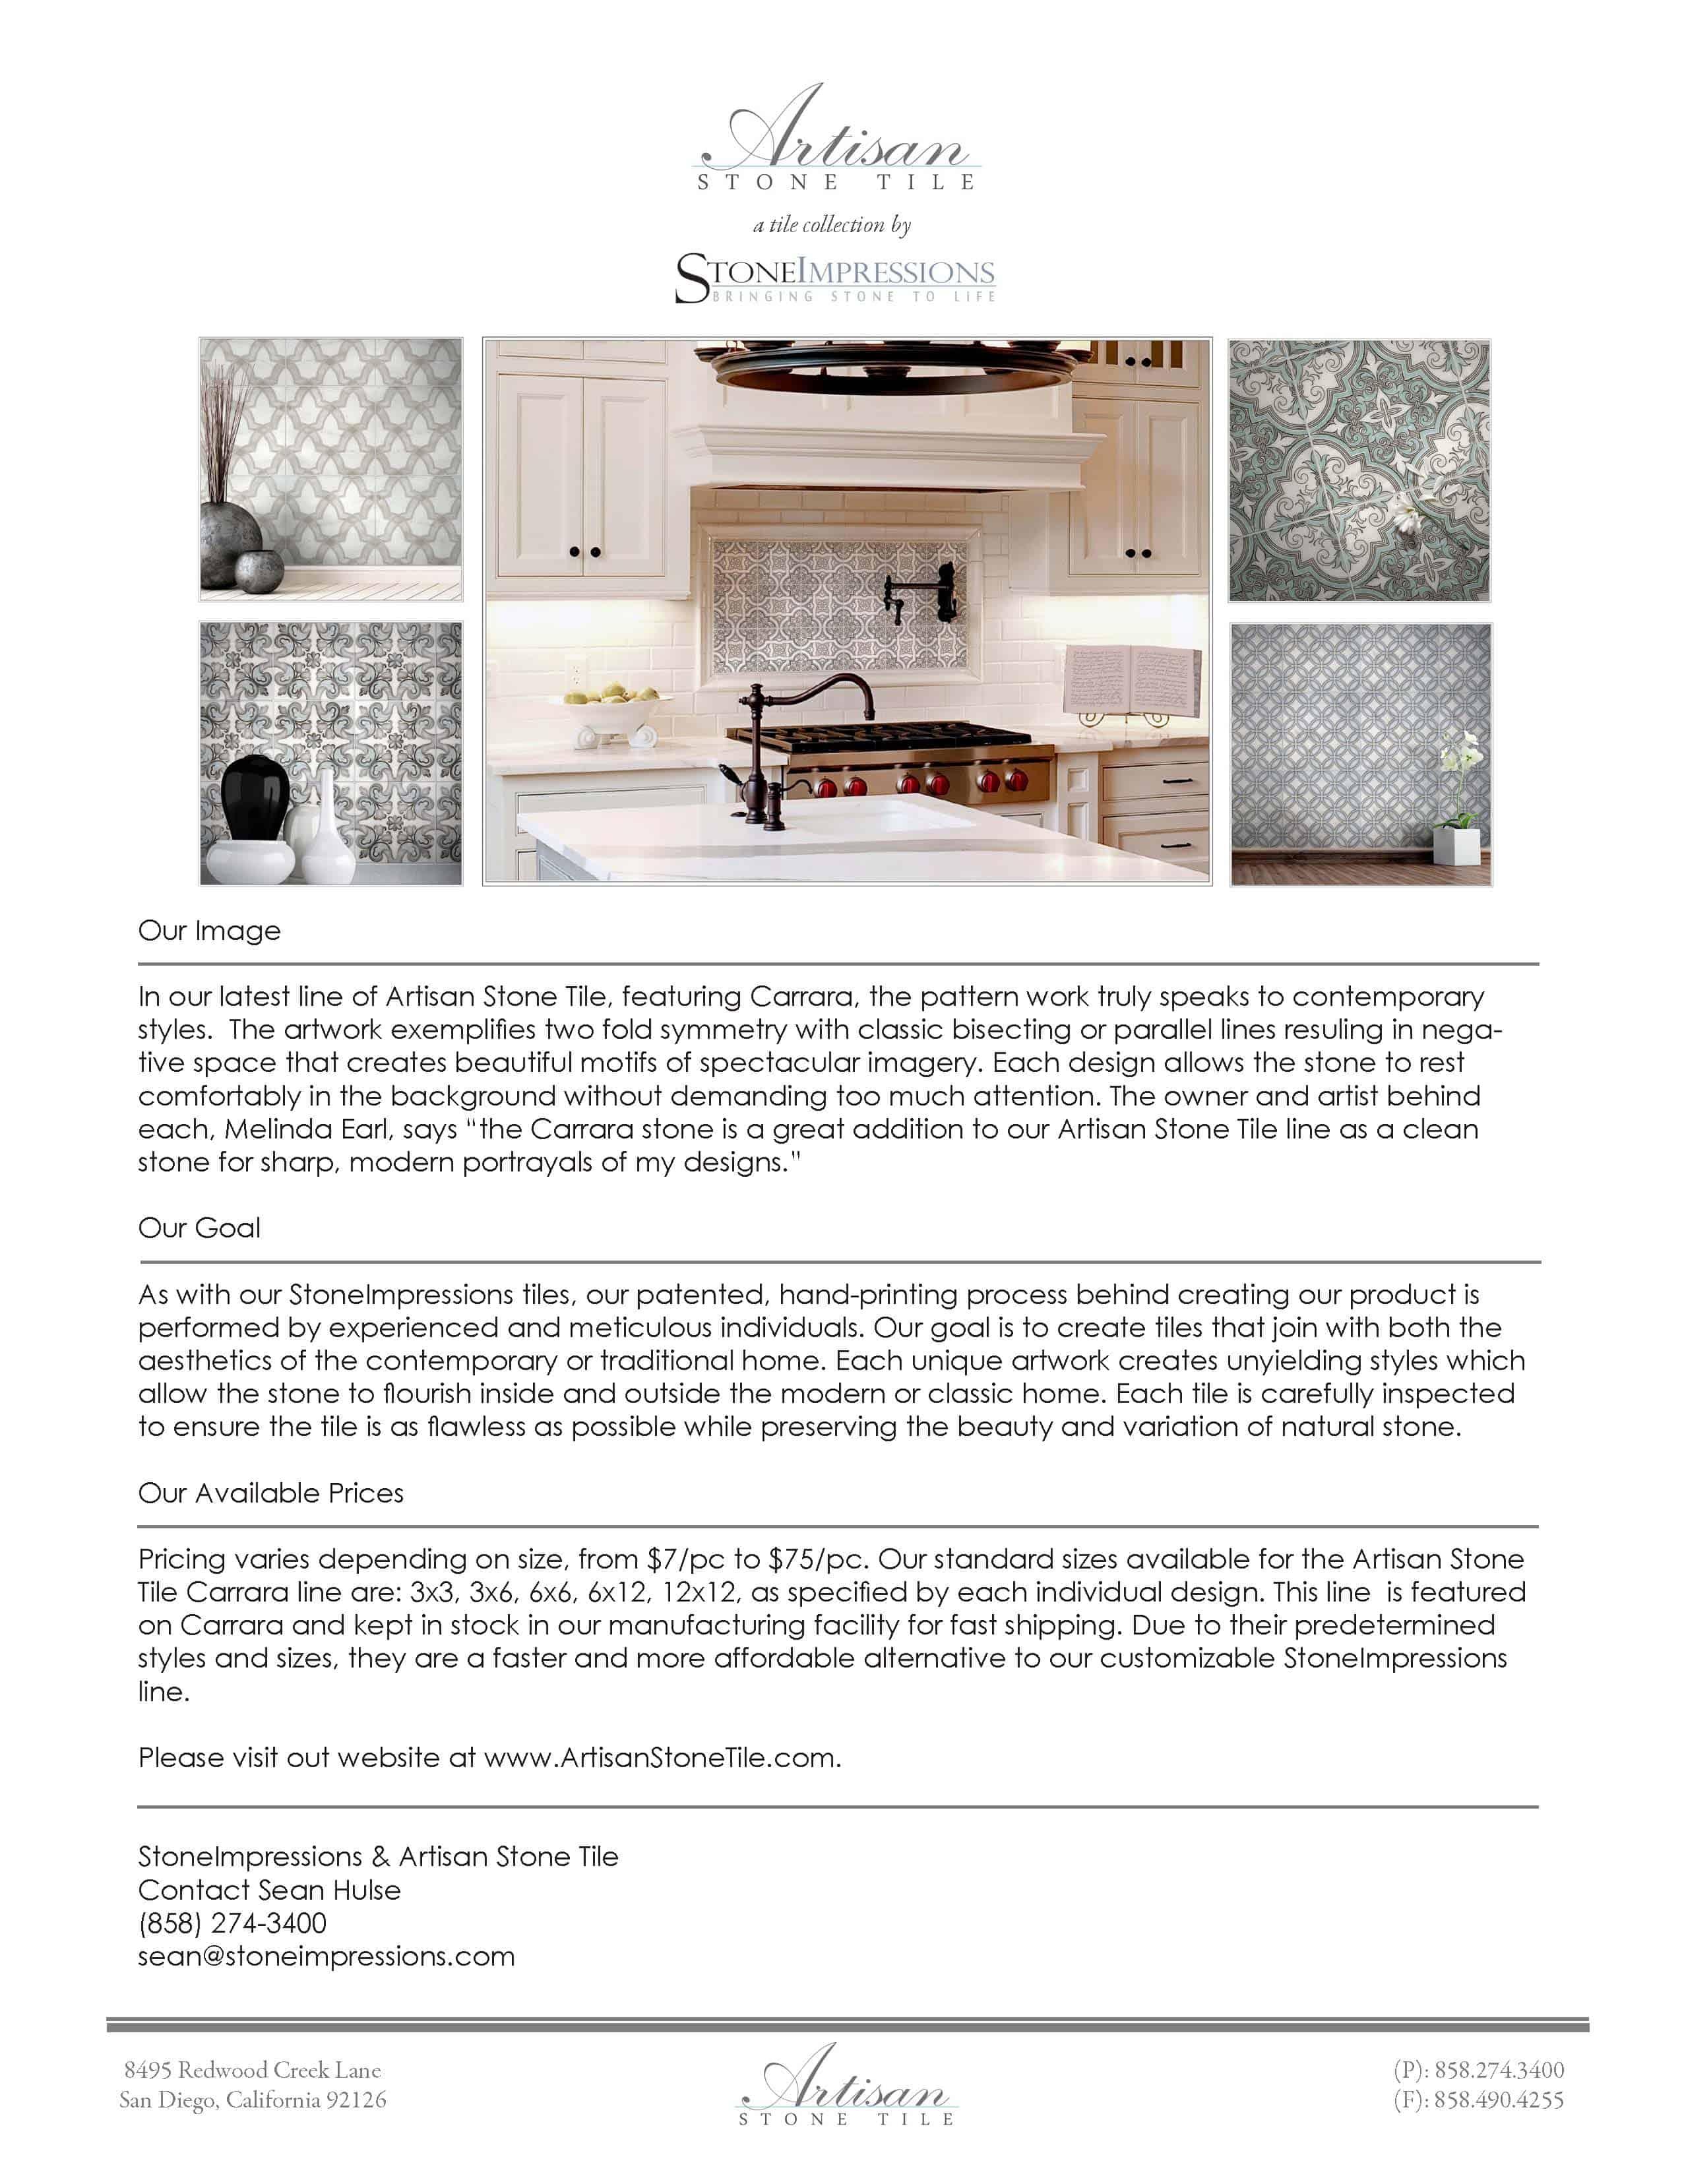 June 2015 - Artisan Stone Tile Carrara Press Release